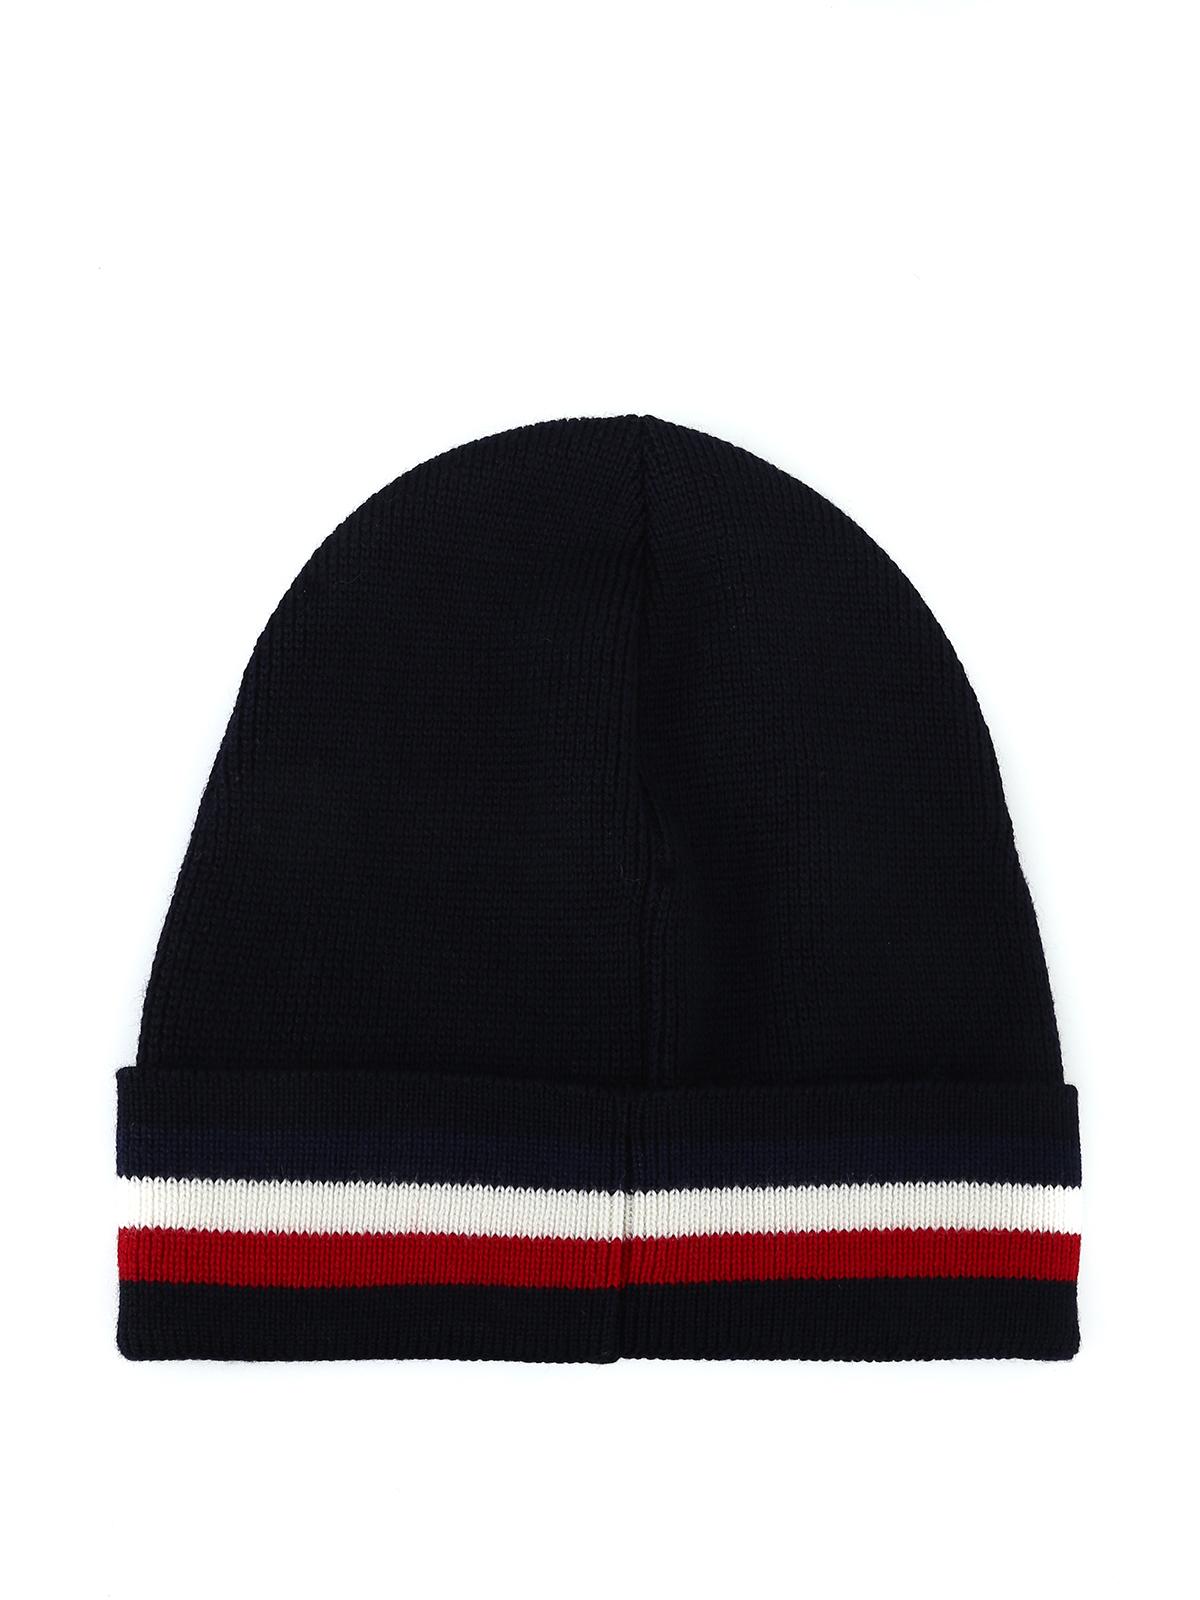 1a6183446d904 Moncler - Striped turn-up knit wool blue beanie - beanies - D2 091 ...